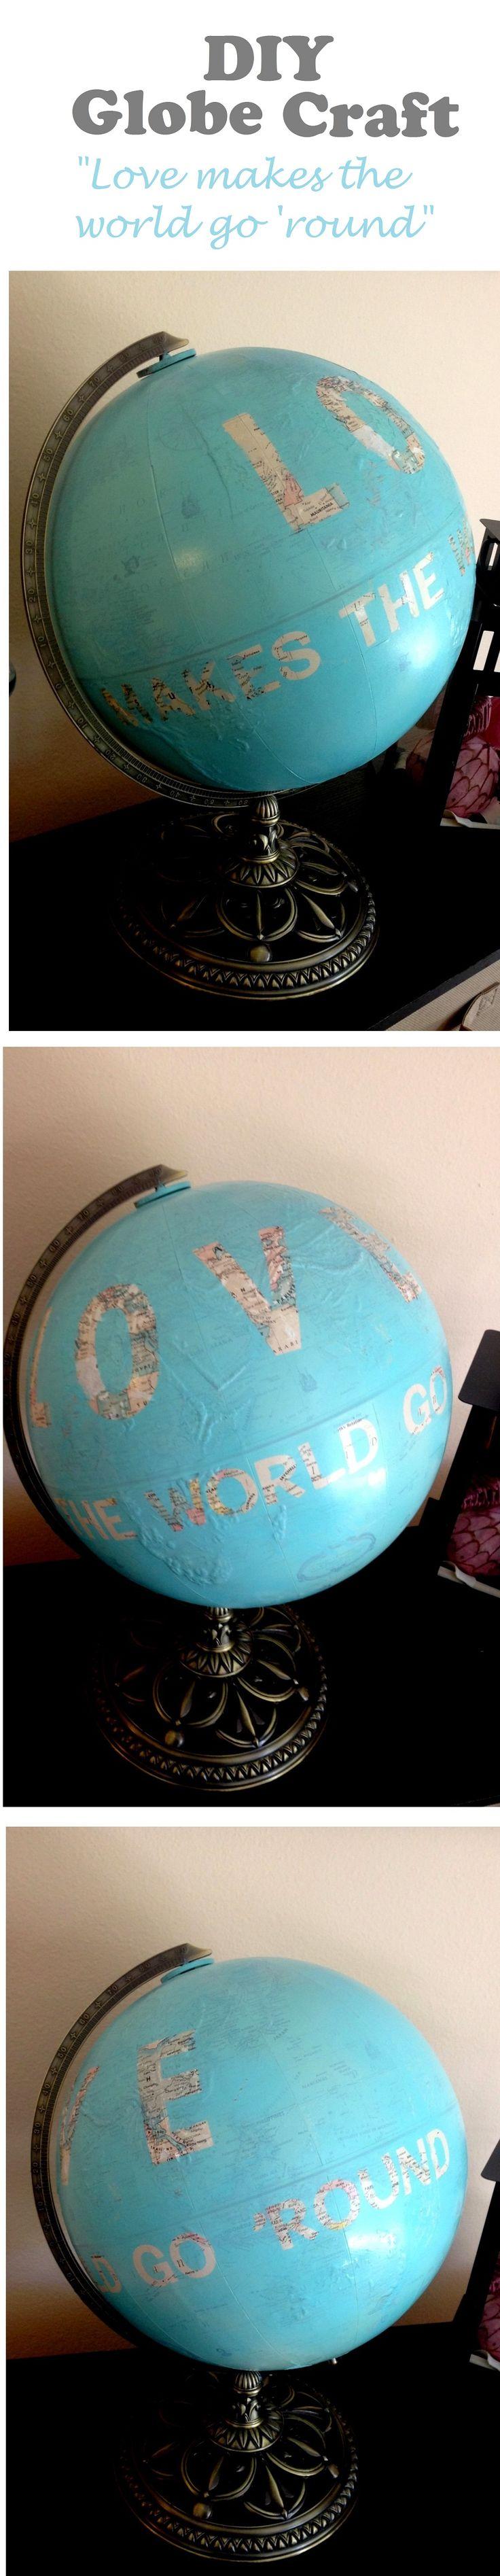 DIY world globe craft- click for tutorial!